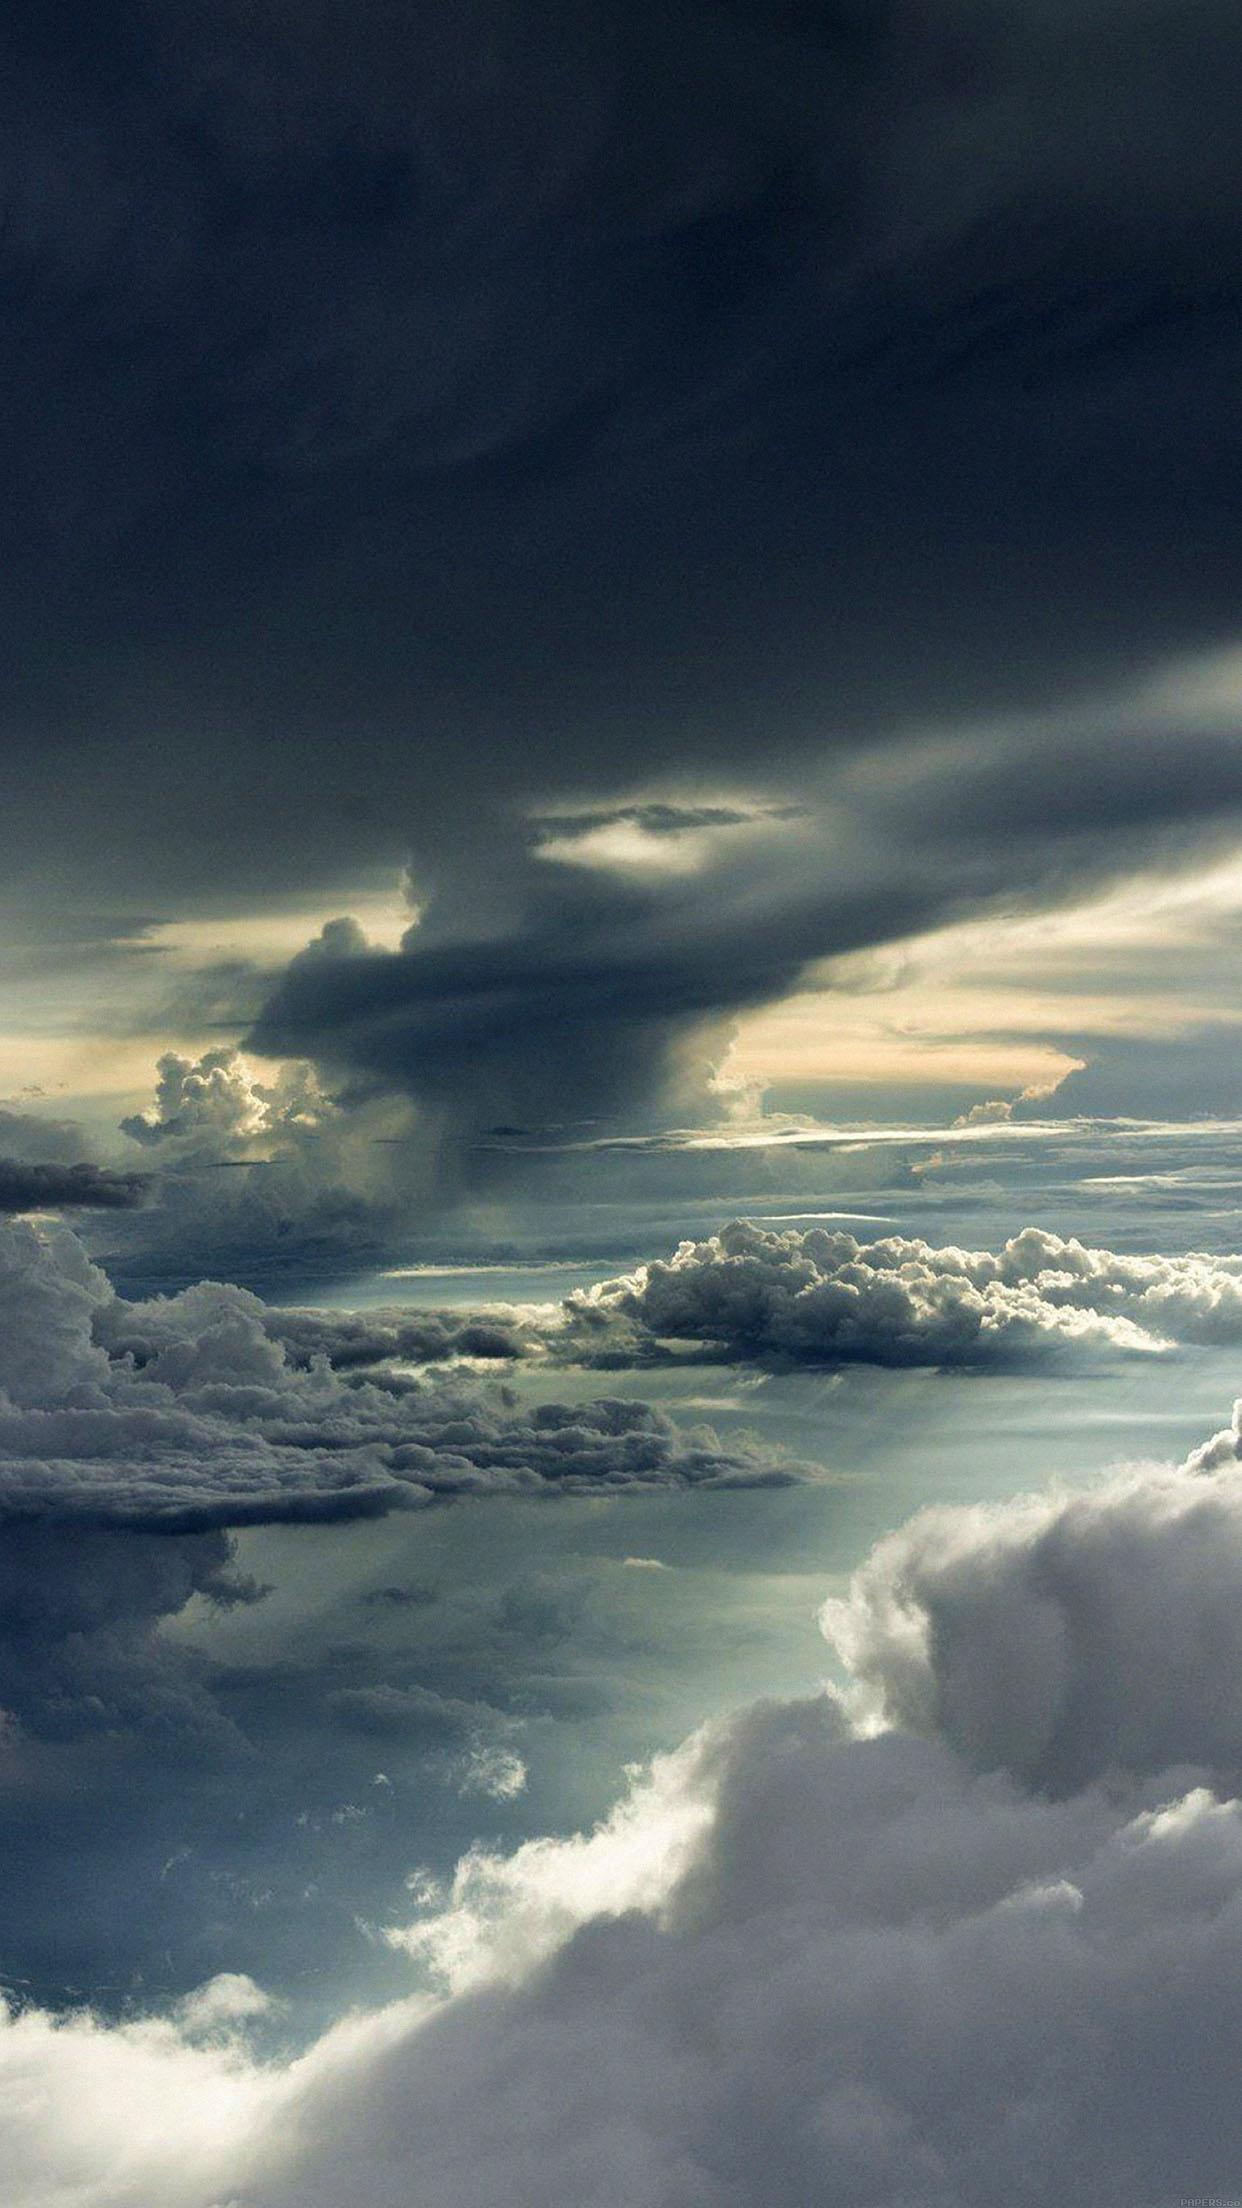 iphone7papers mc83 wallpaper between storm clouds sky